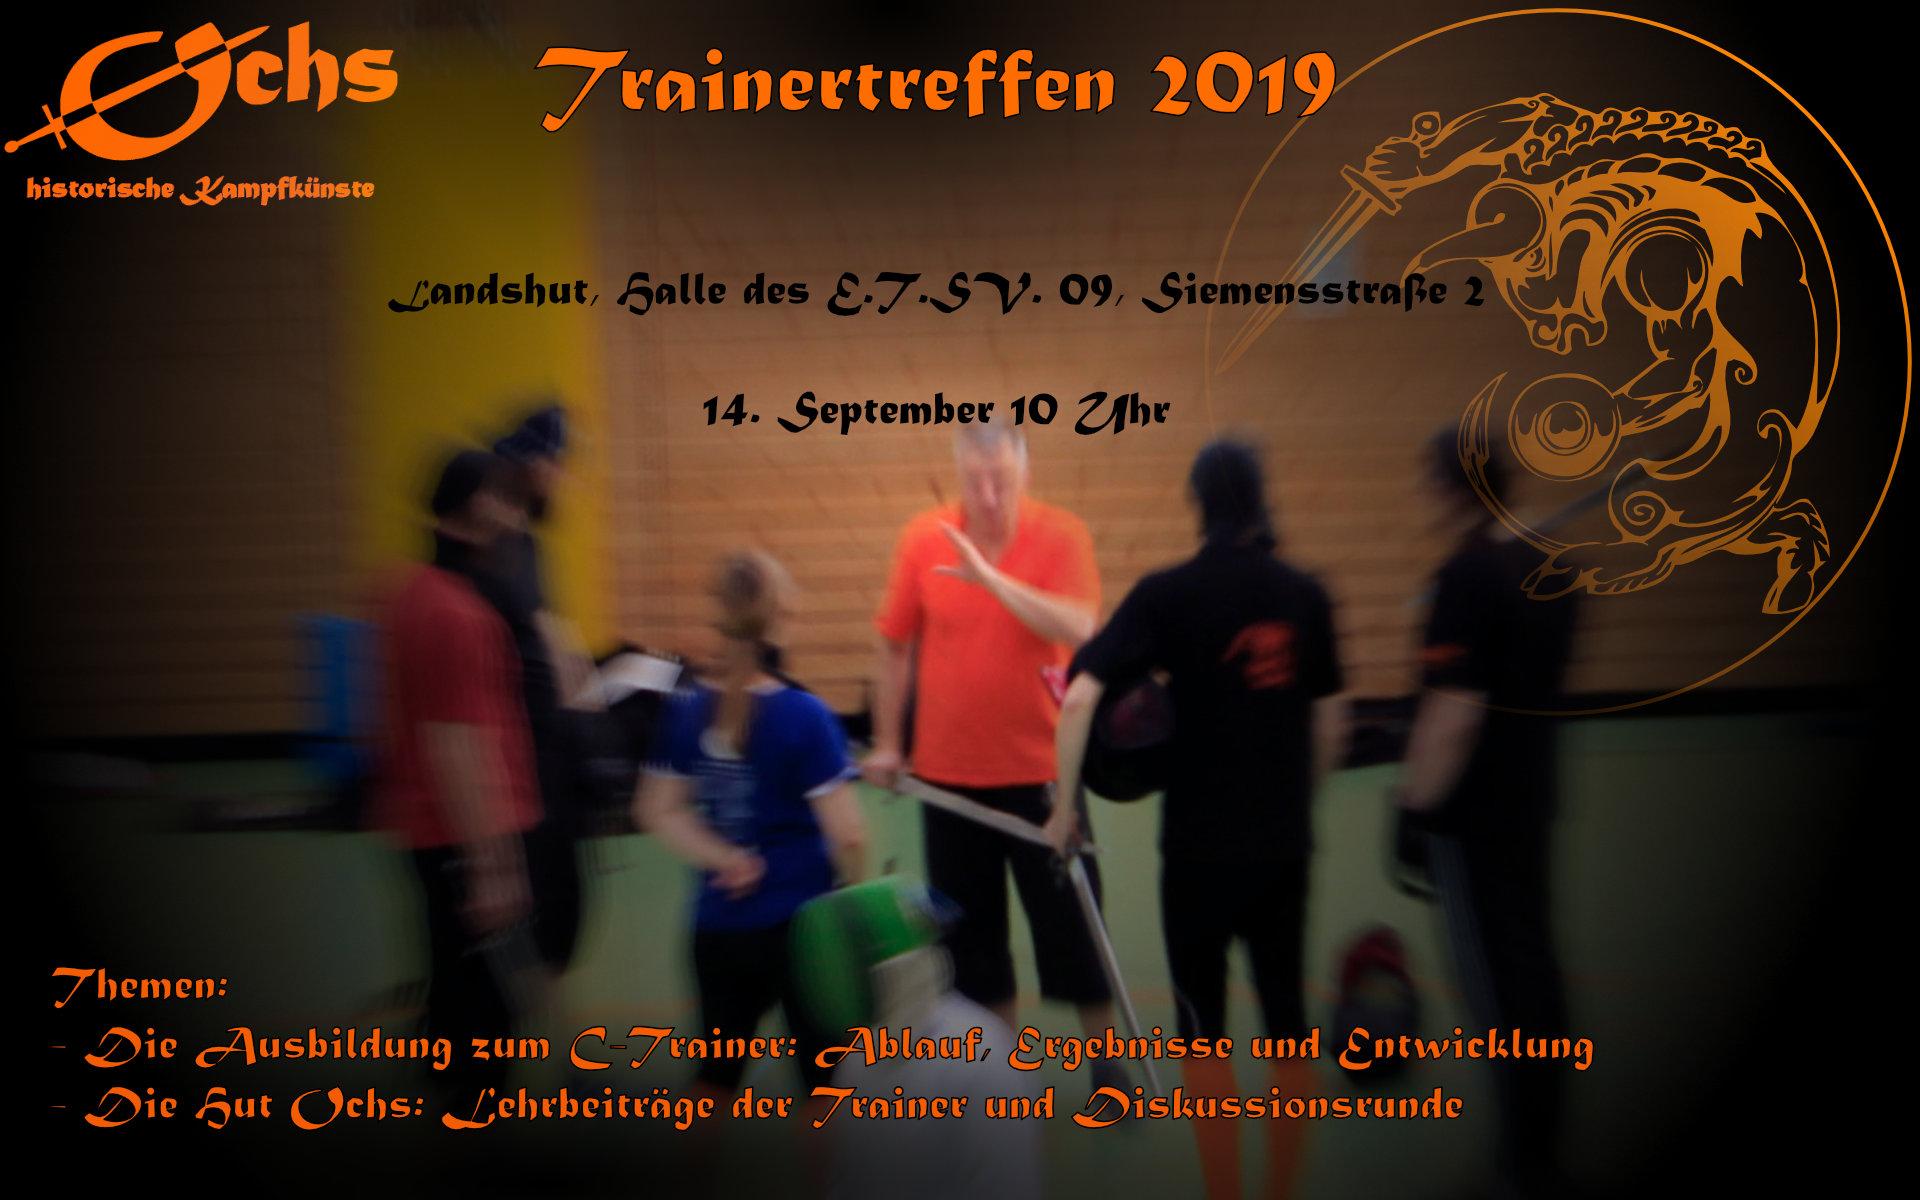 Ochs-Trainertreffen 2019